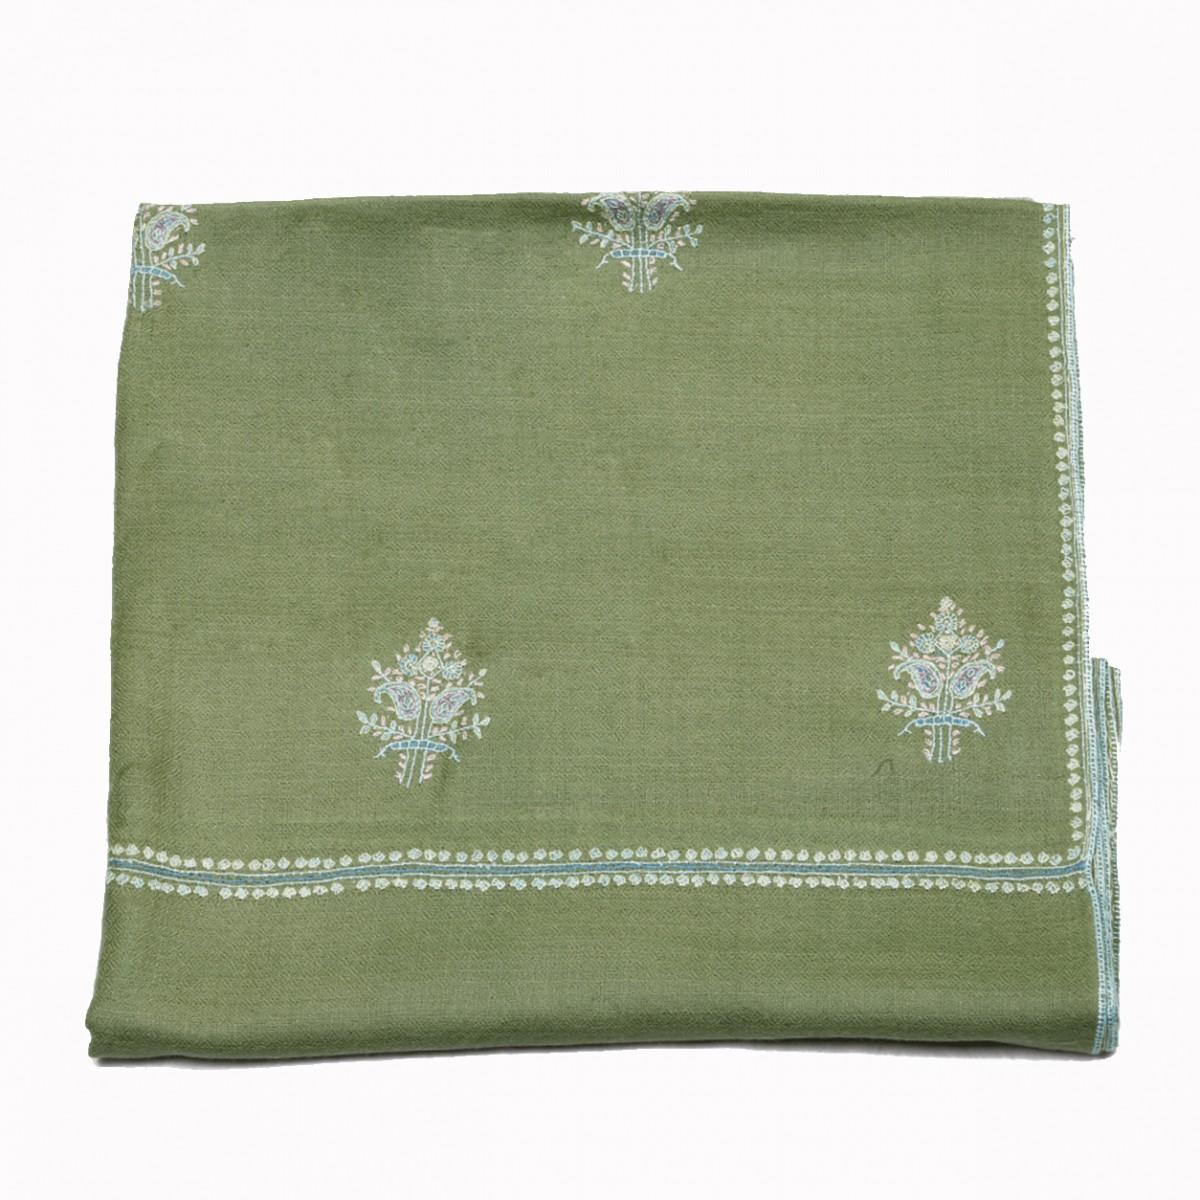 Embroidery Handloom Pashmina - Laurel